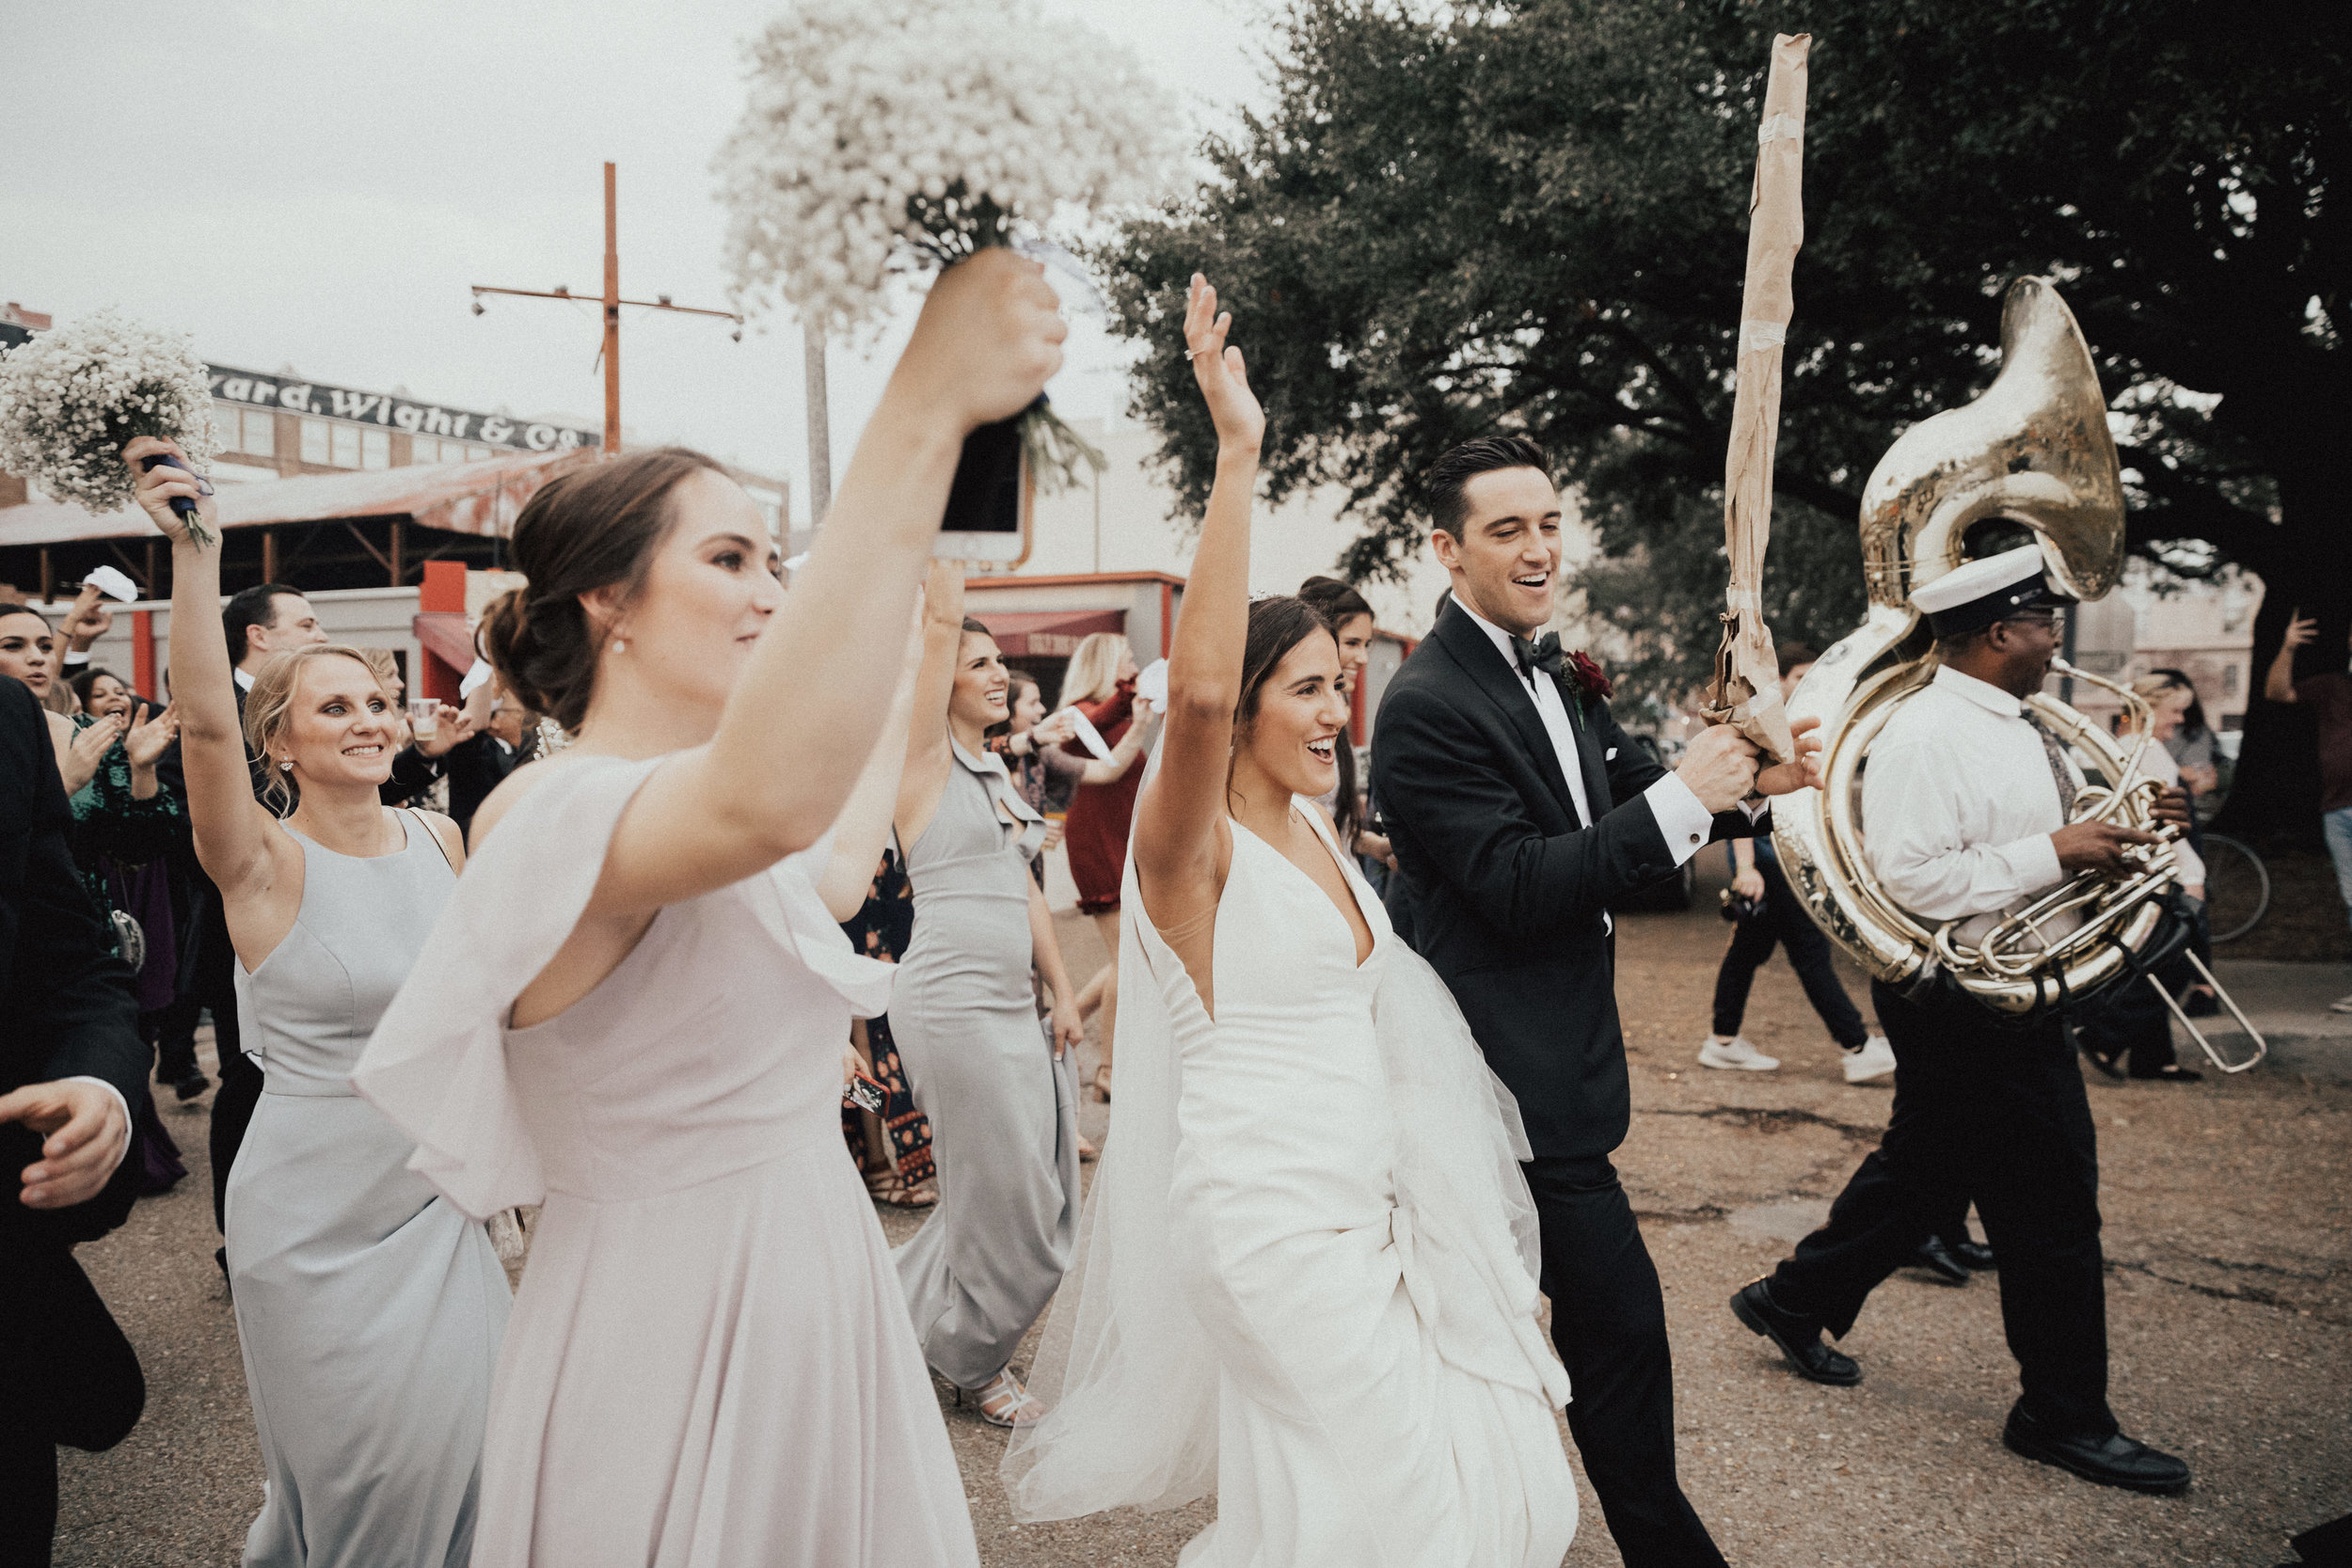 magners wedding (85 of 145).jpg